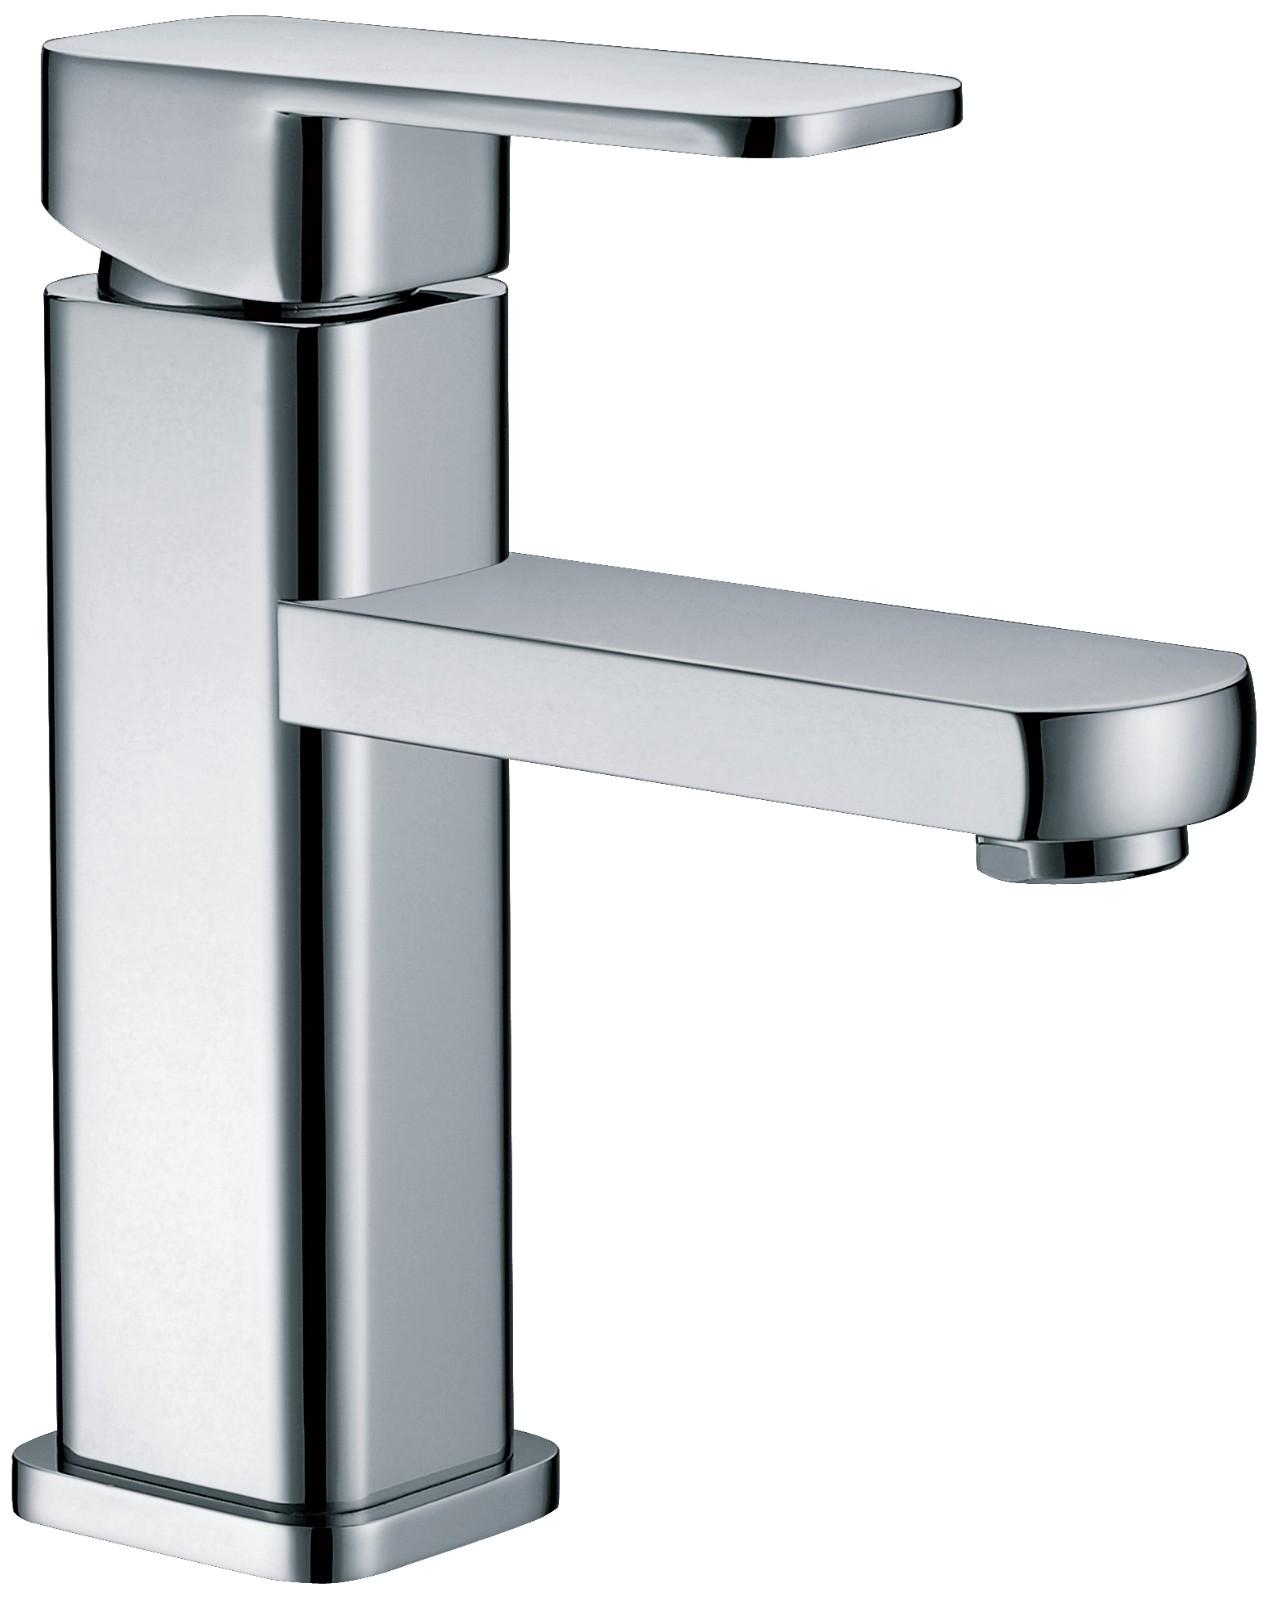 KEDIBO fashion bathroom sink basin for super market-16